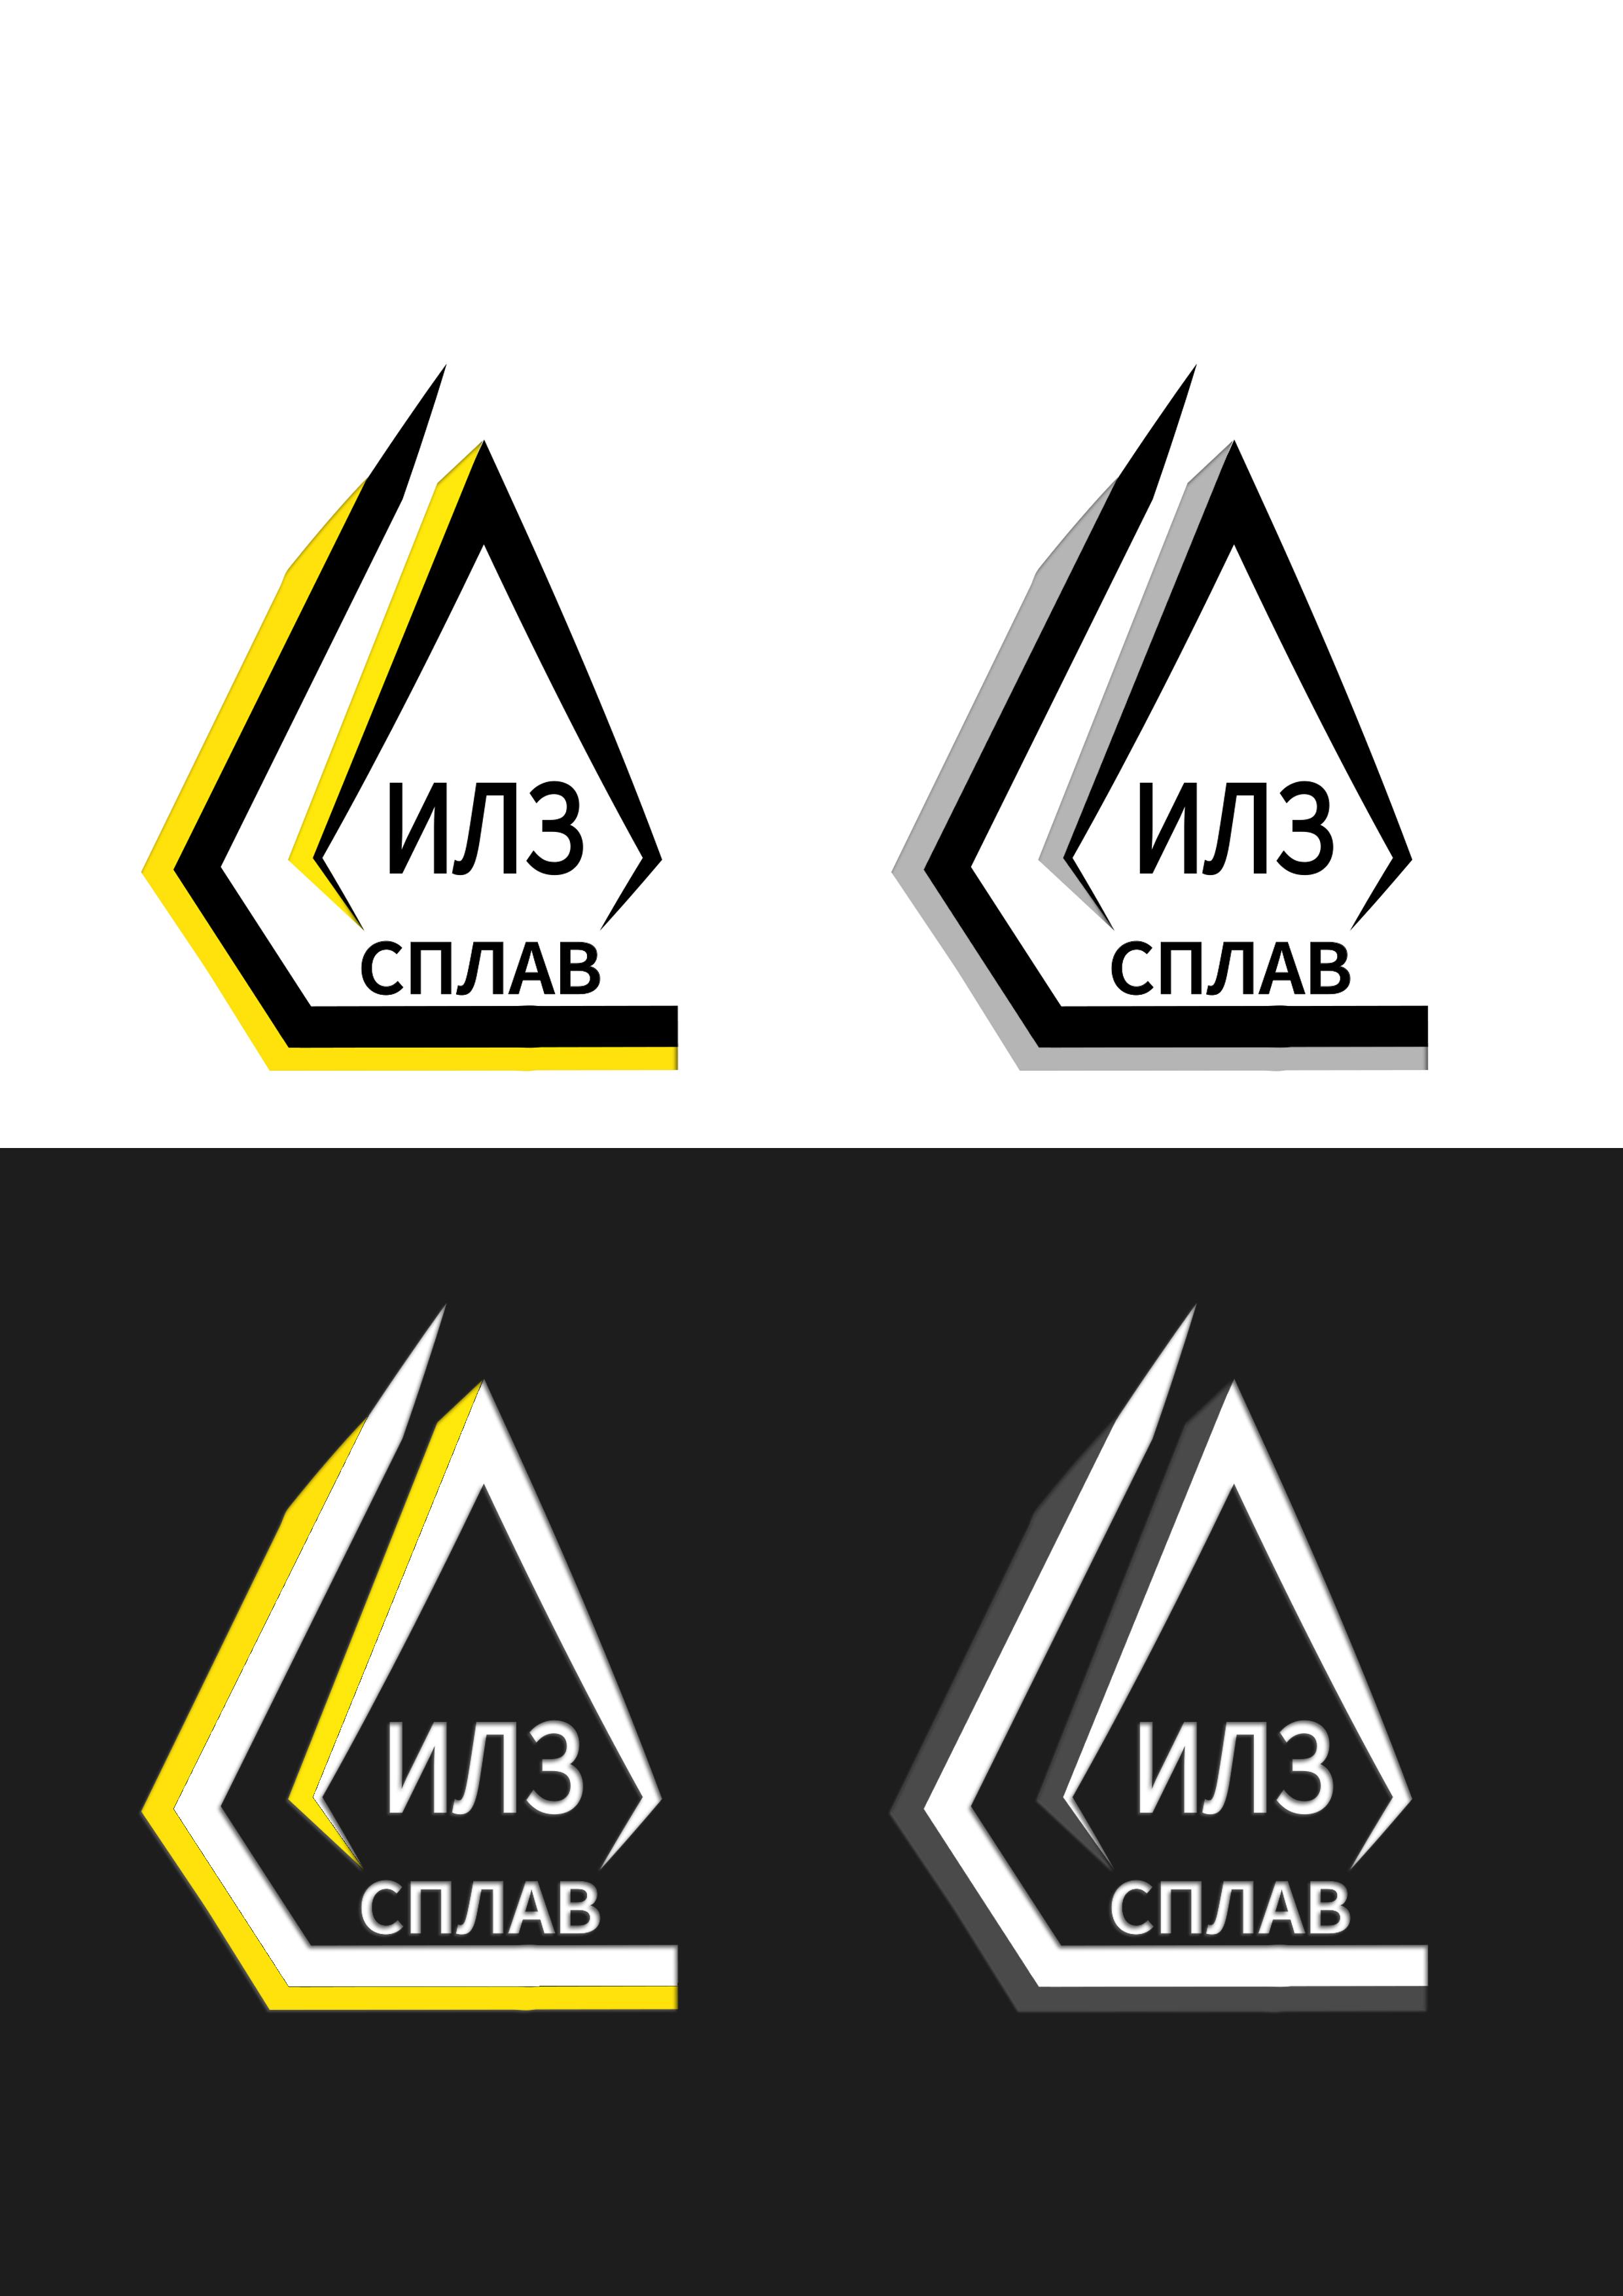 Разработать логотип для литейного завода фото f_3905b14589f8ff11.jpg